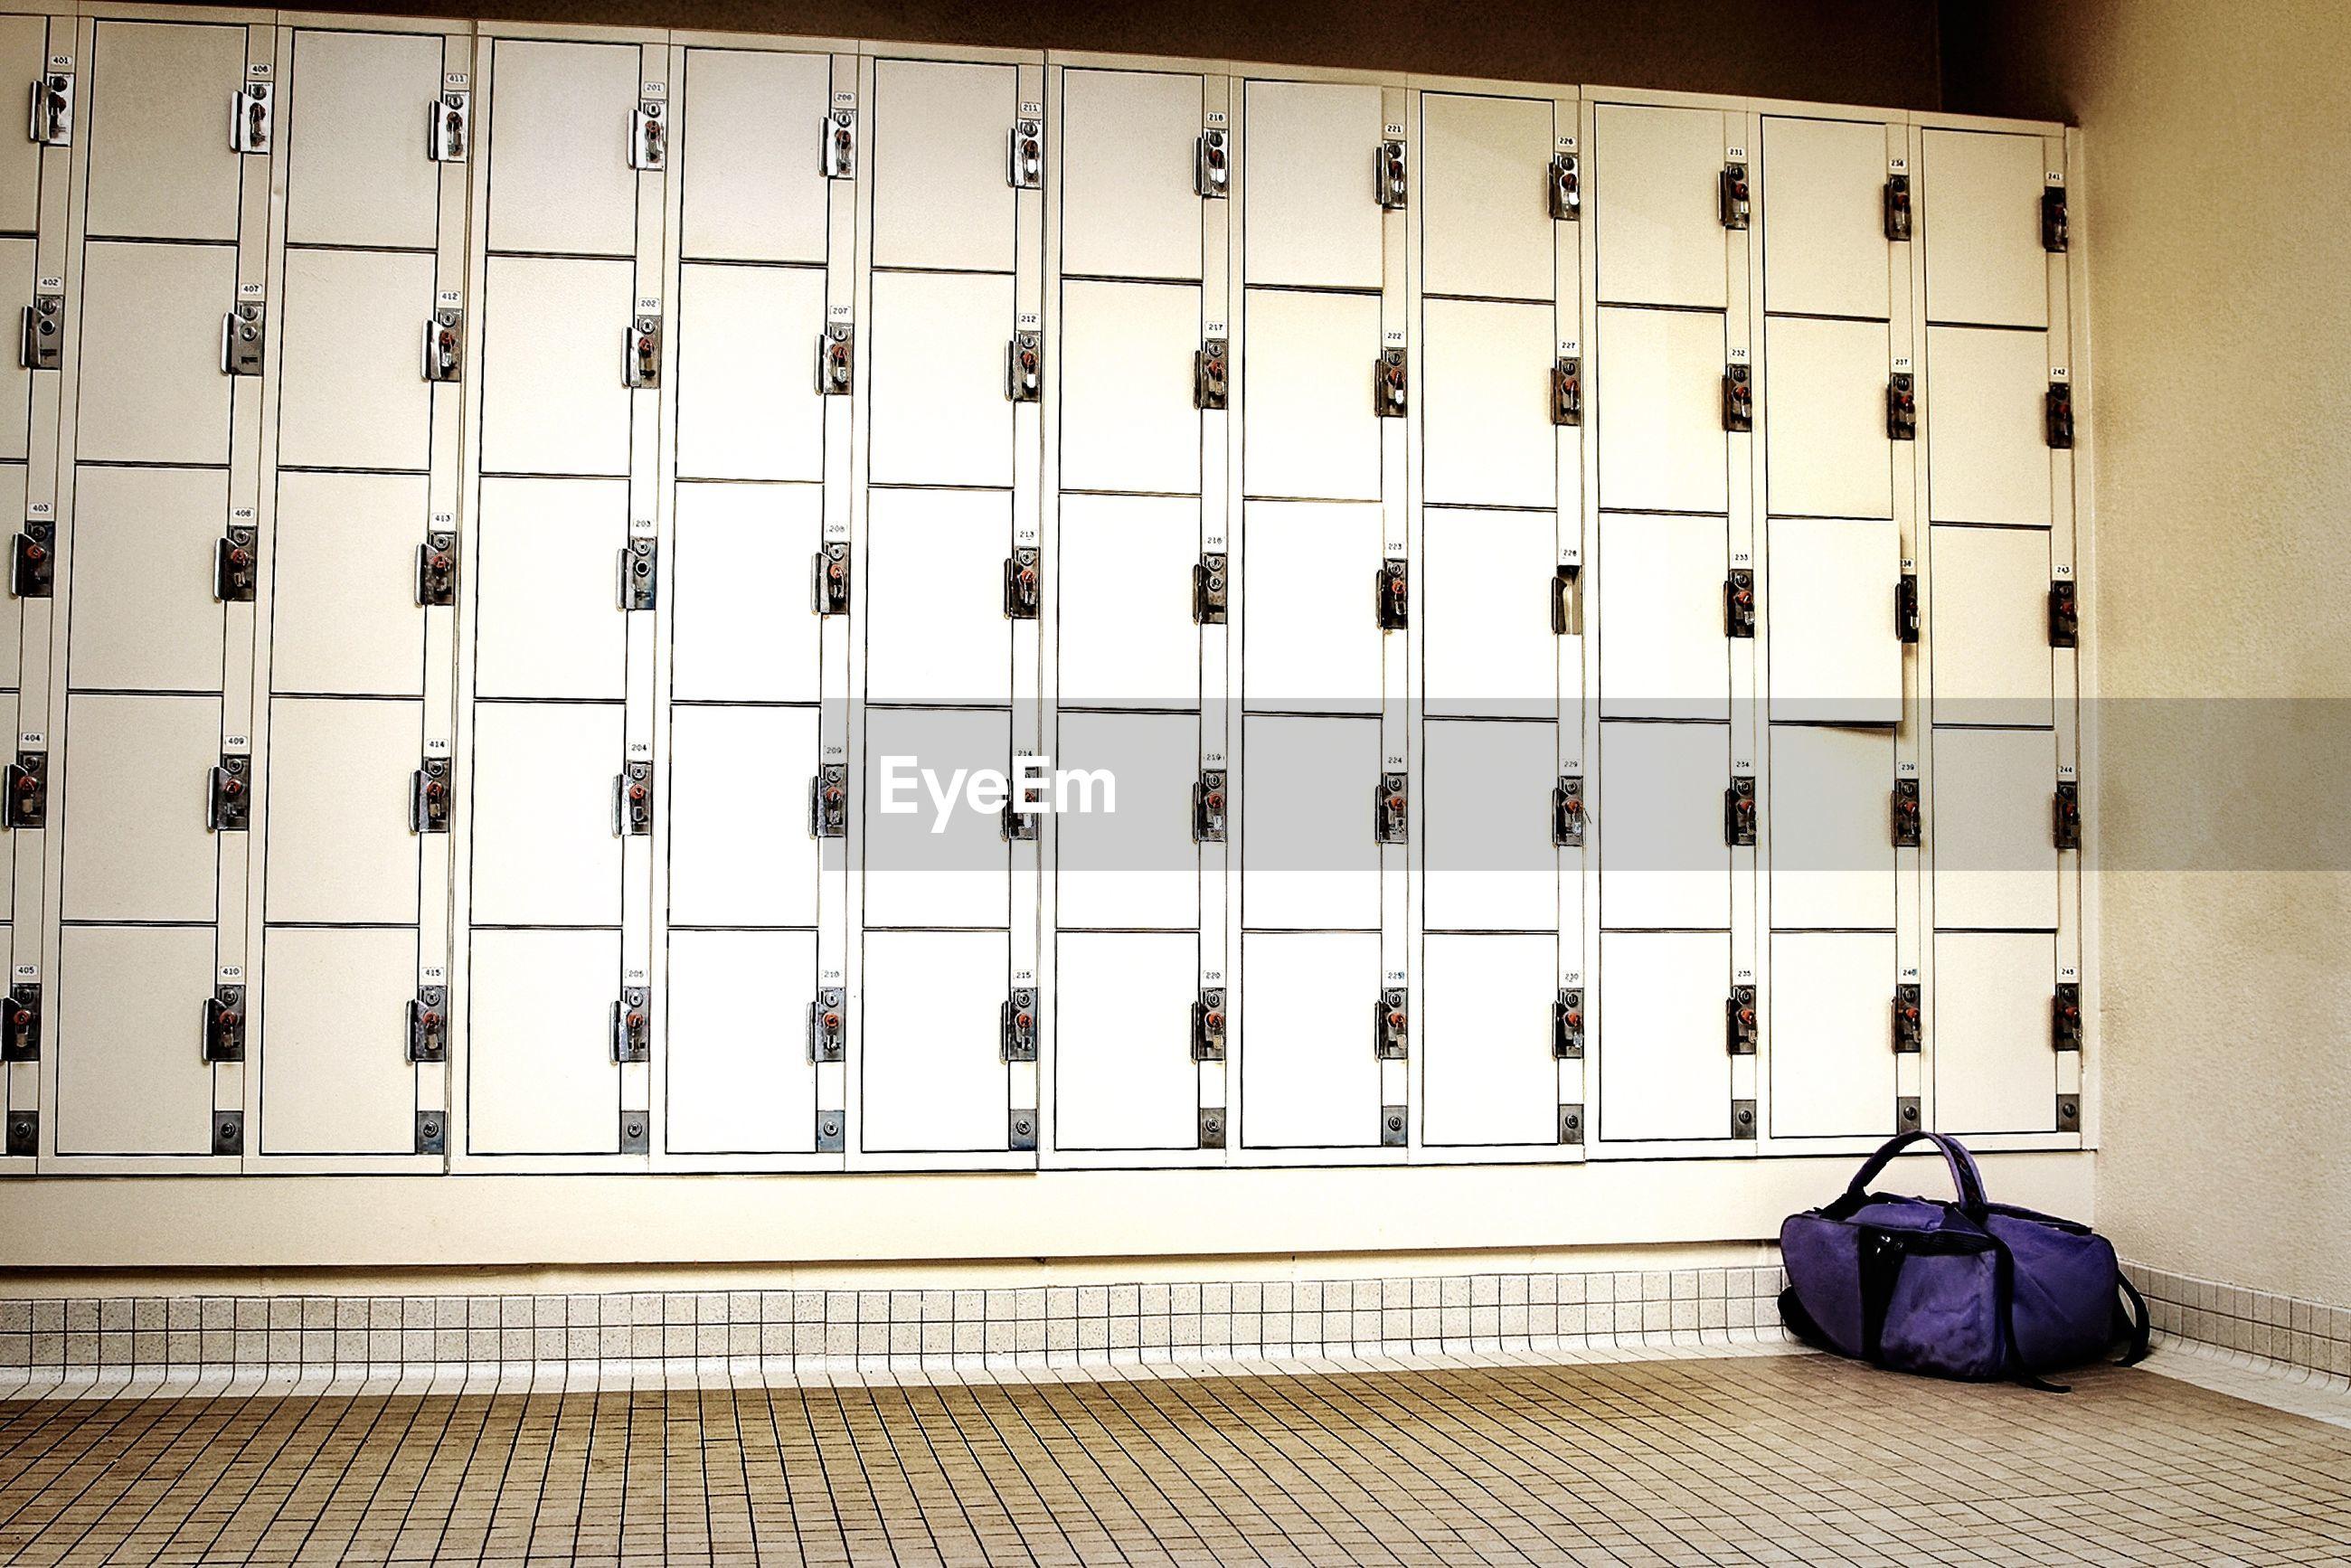 Bag in locker room